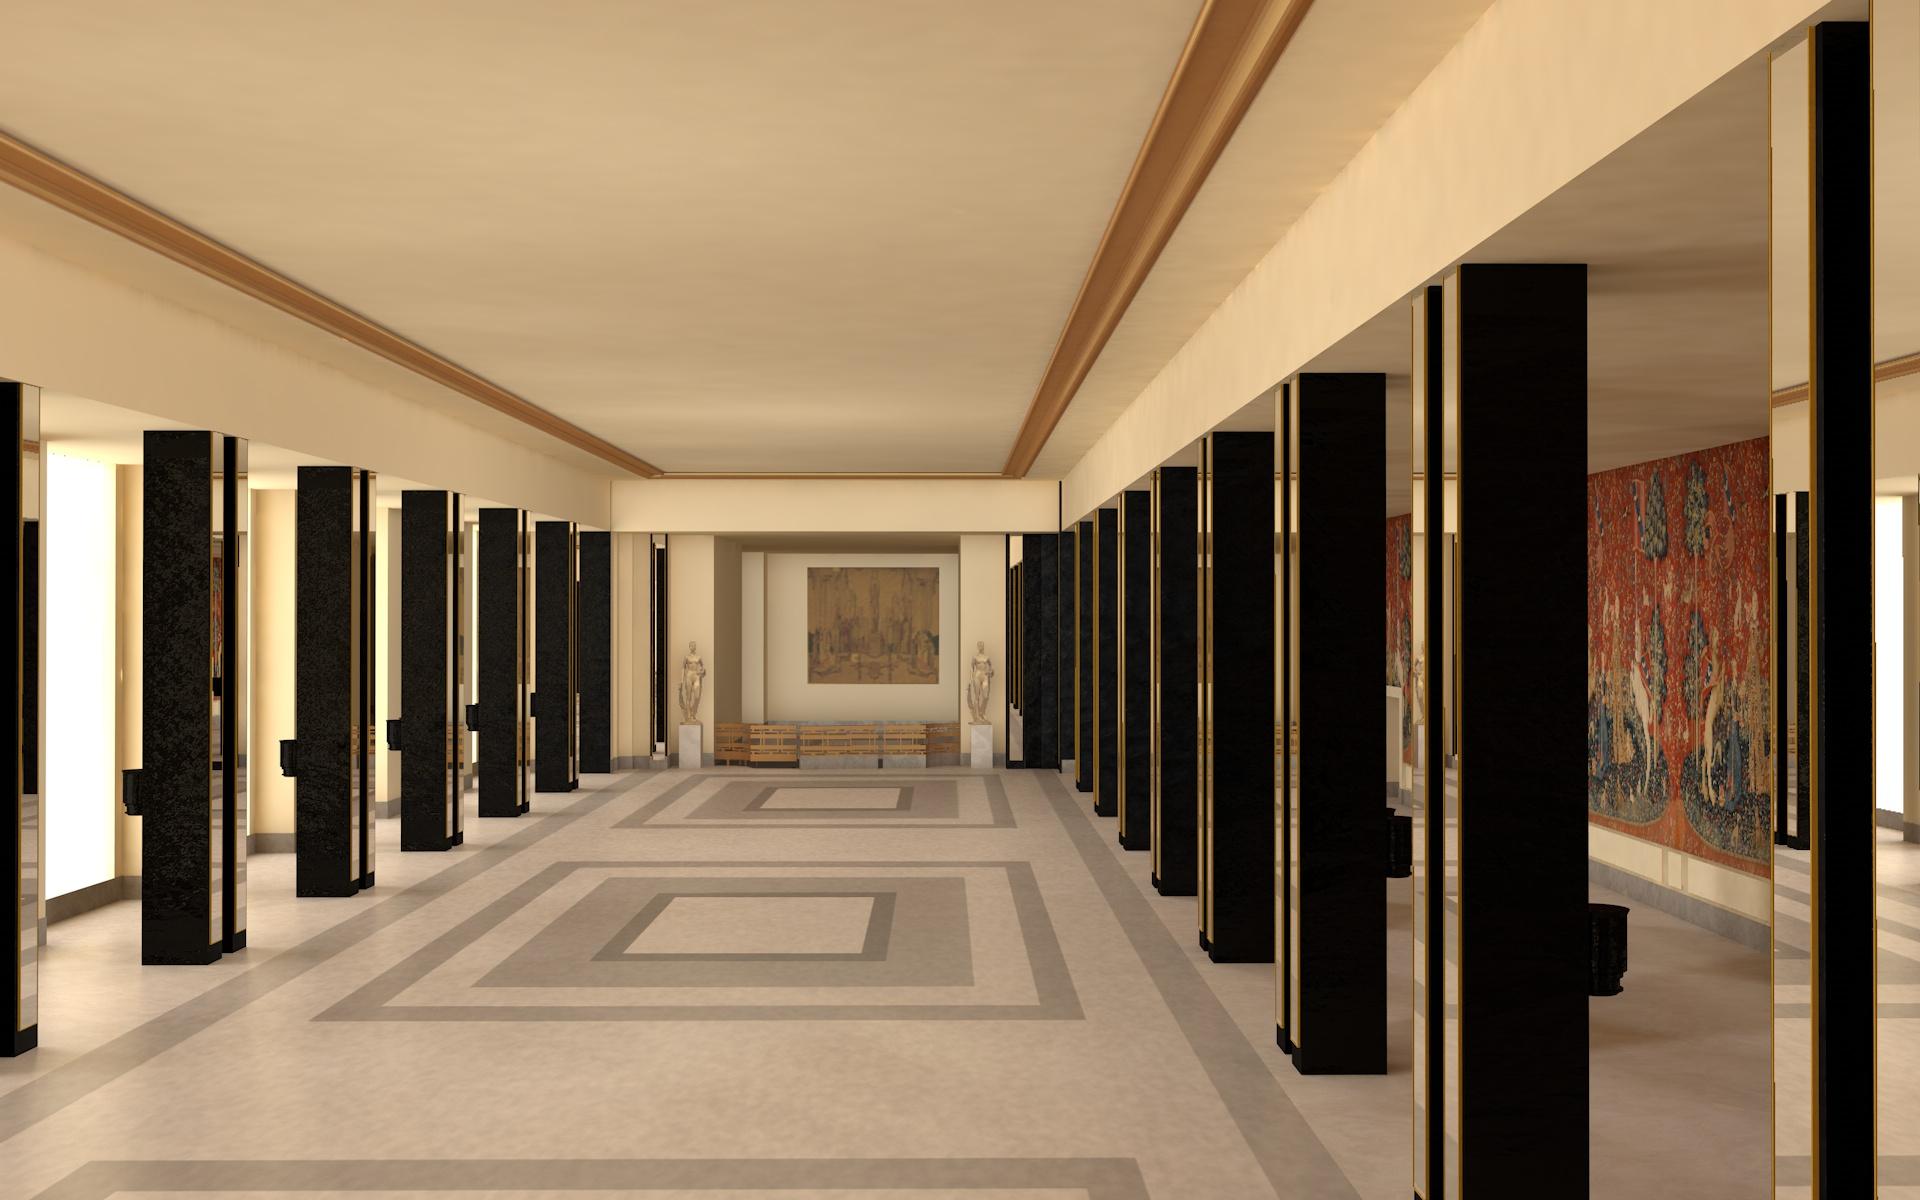 Grand Foyer Chaillot : Palais de chaillot foyer jal concept